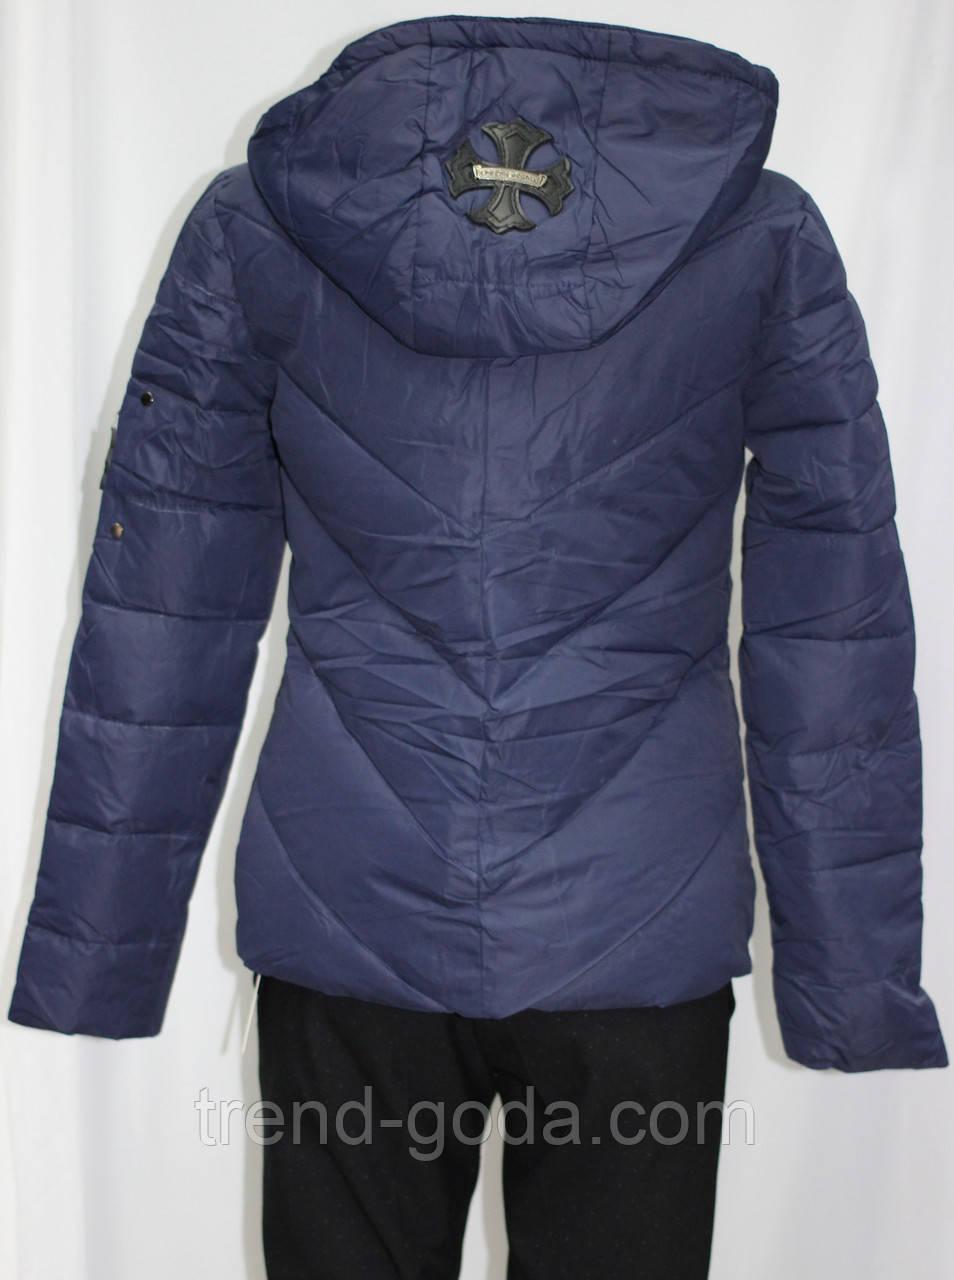 9c0478f8bb3 ... Куртка короткая молодежная осенняя